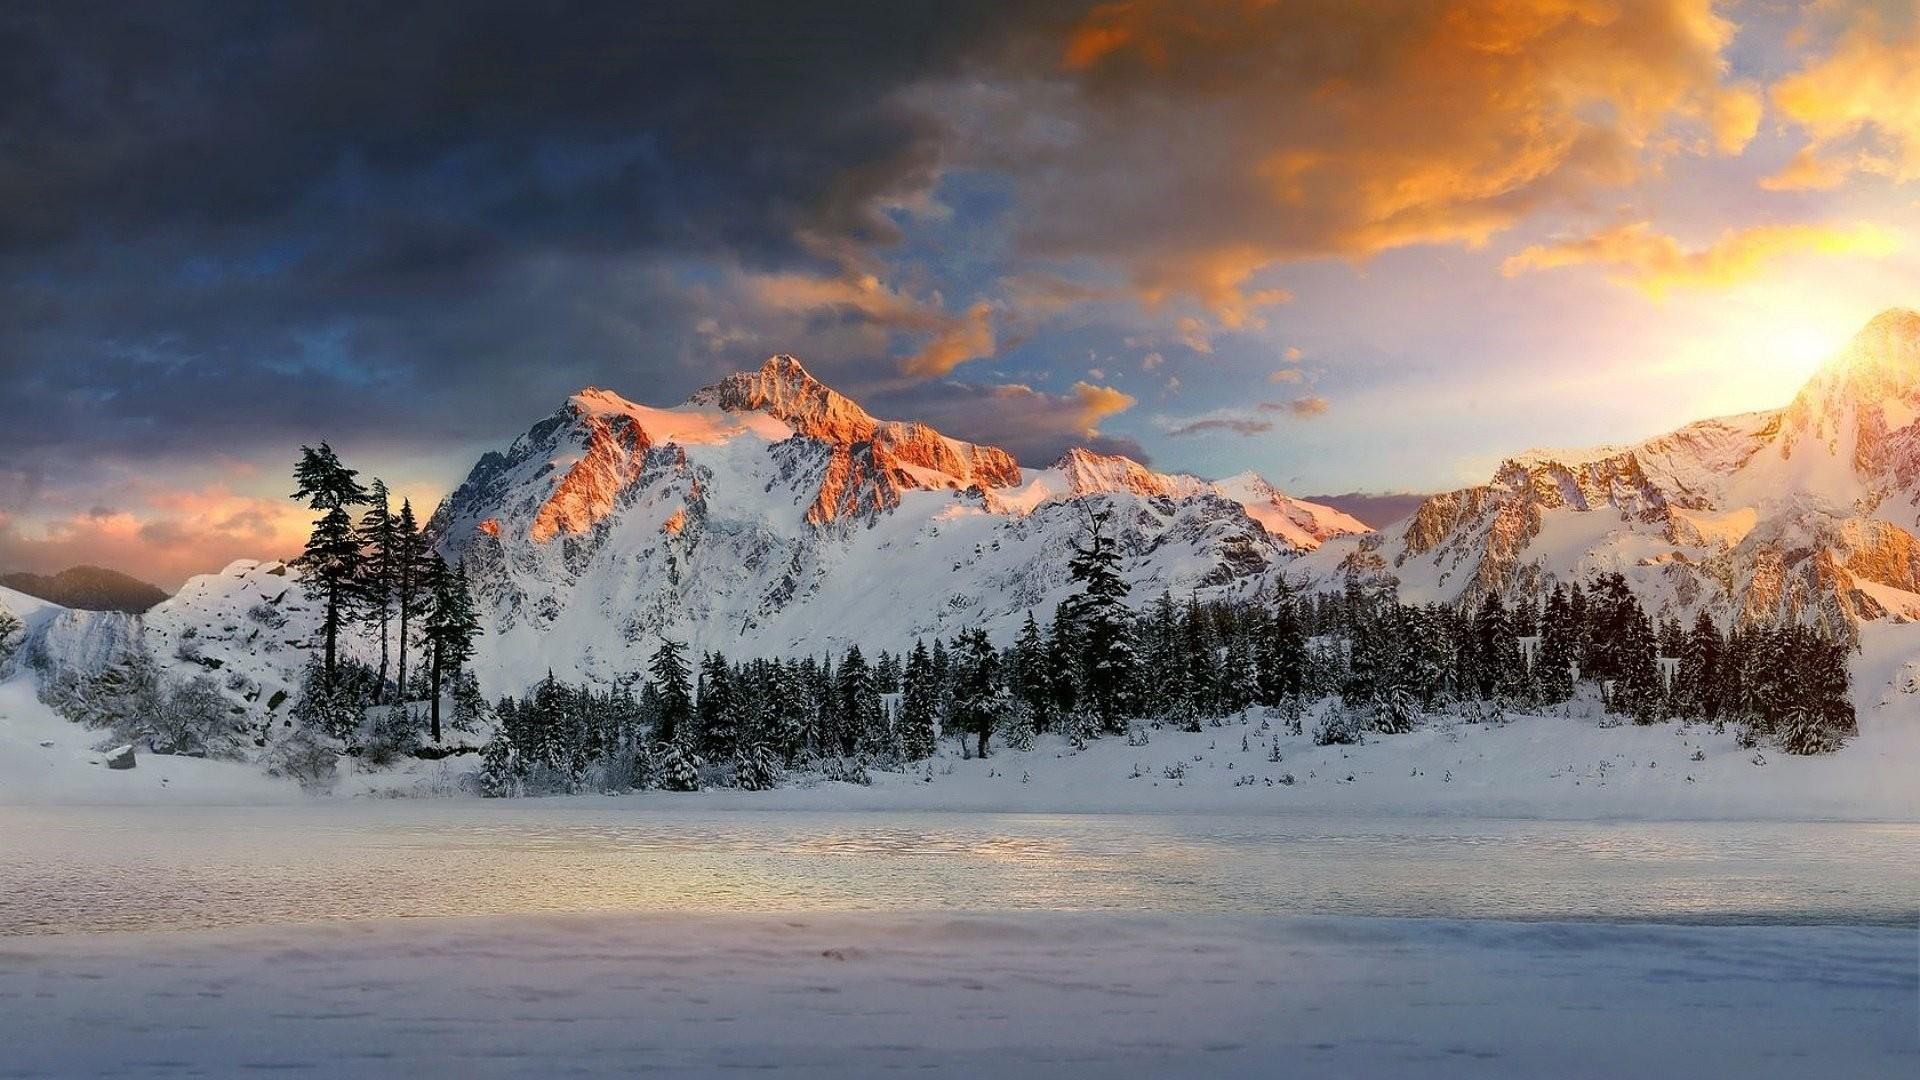 Snow Mountain Wallpaper image hd